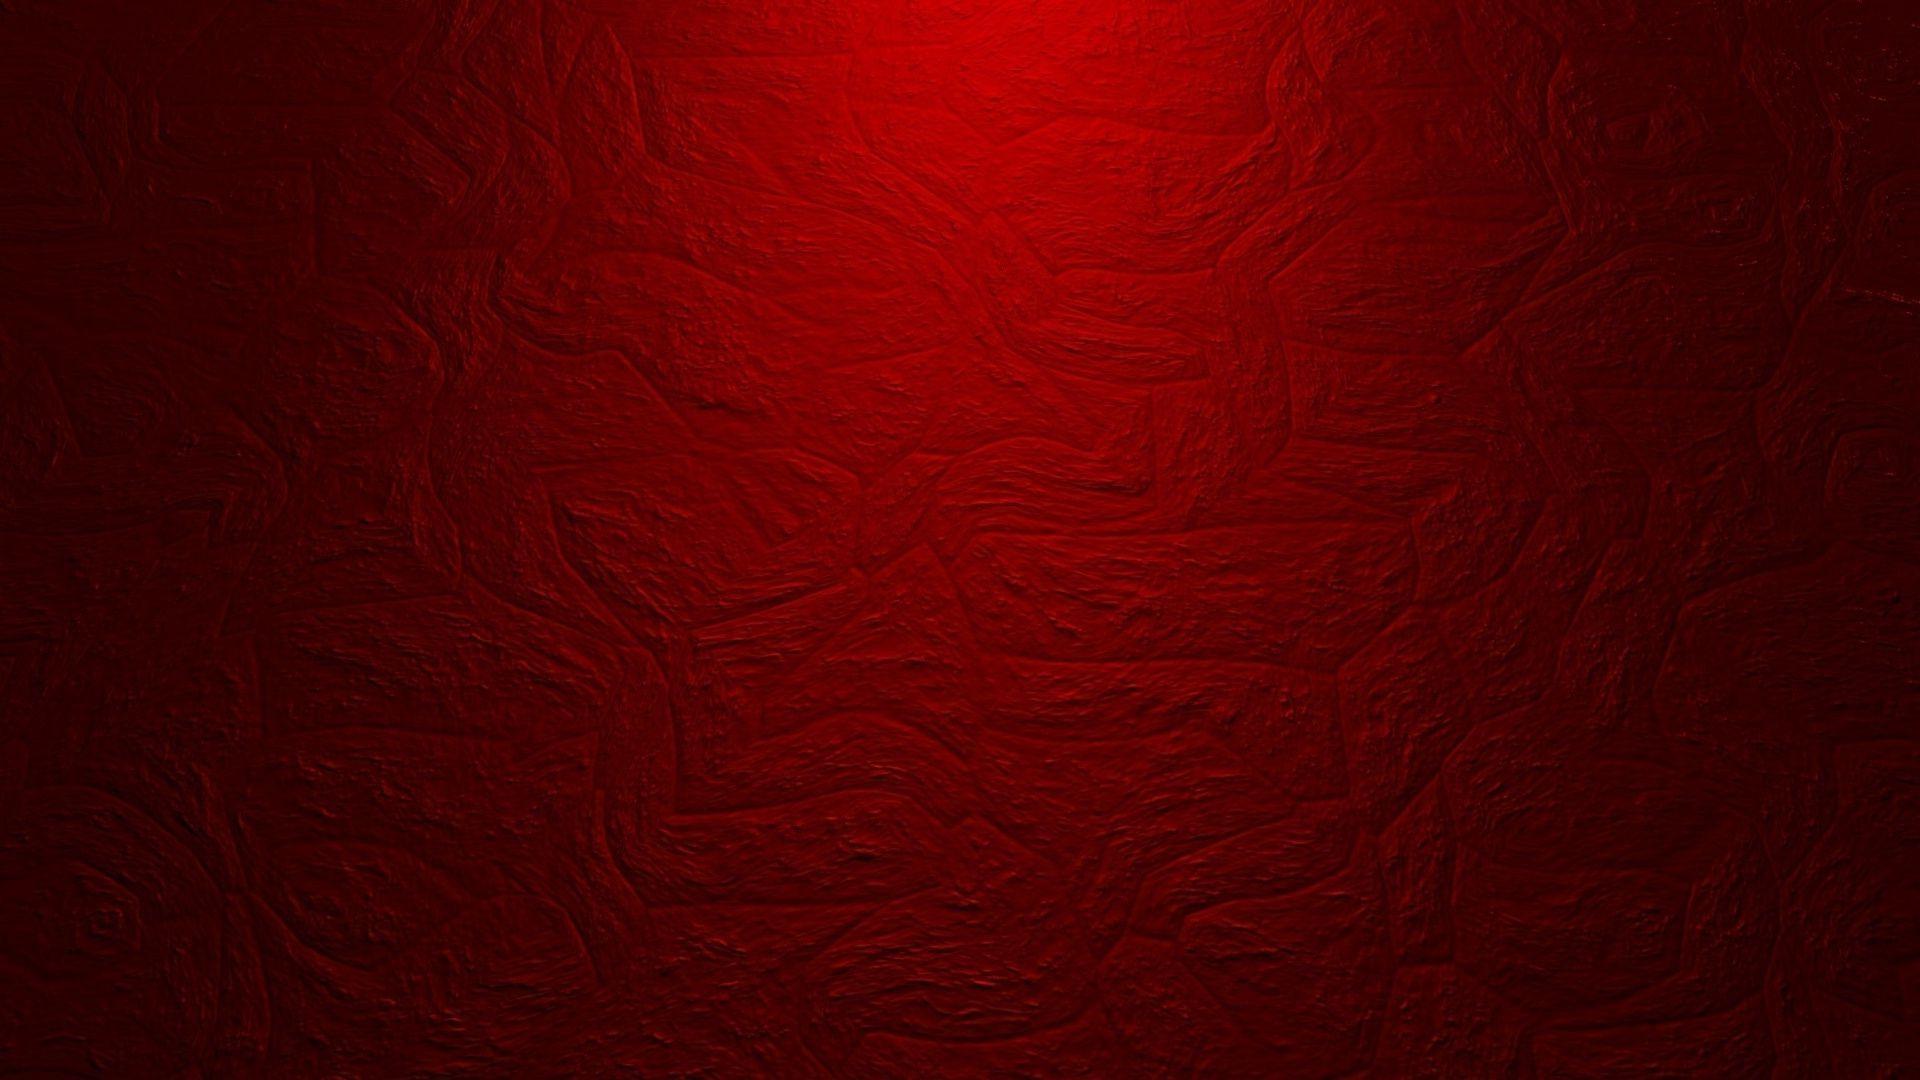 Red wall wallpaper 20669 1920x1080